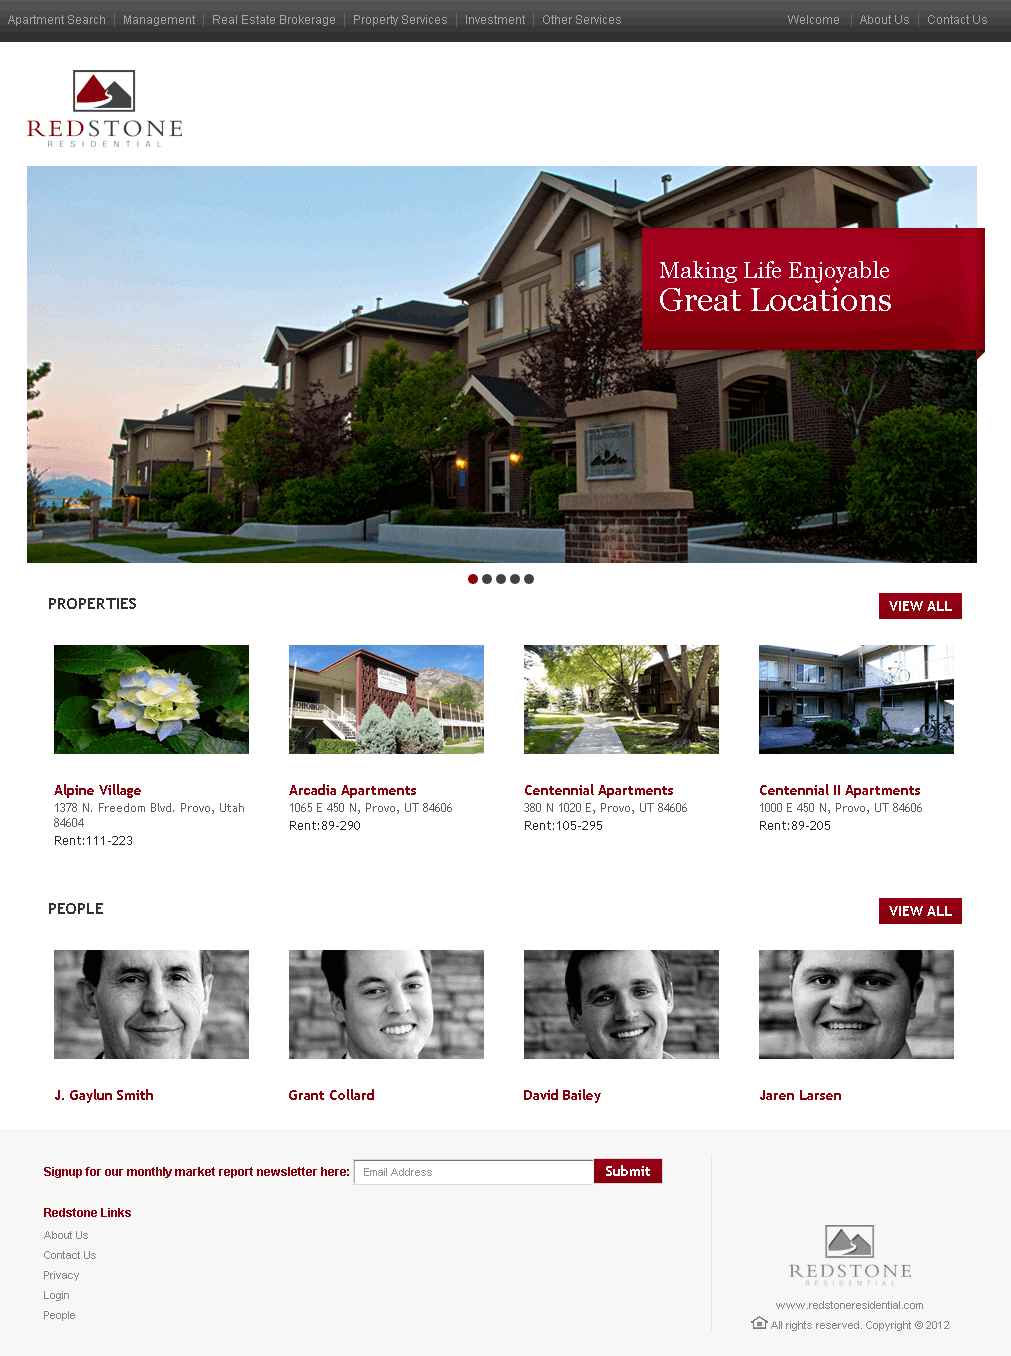 Development of A Zend Based Student Housing Management Website